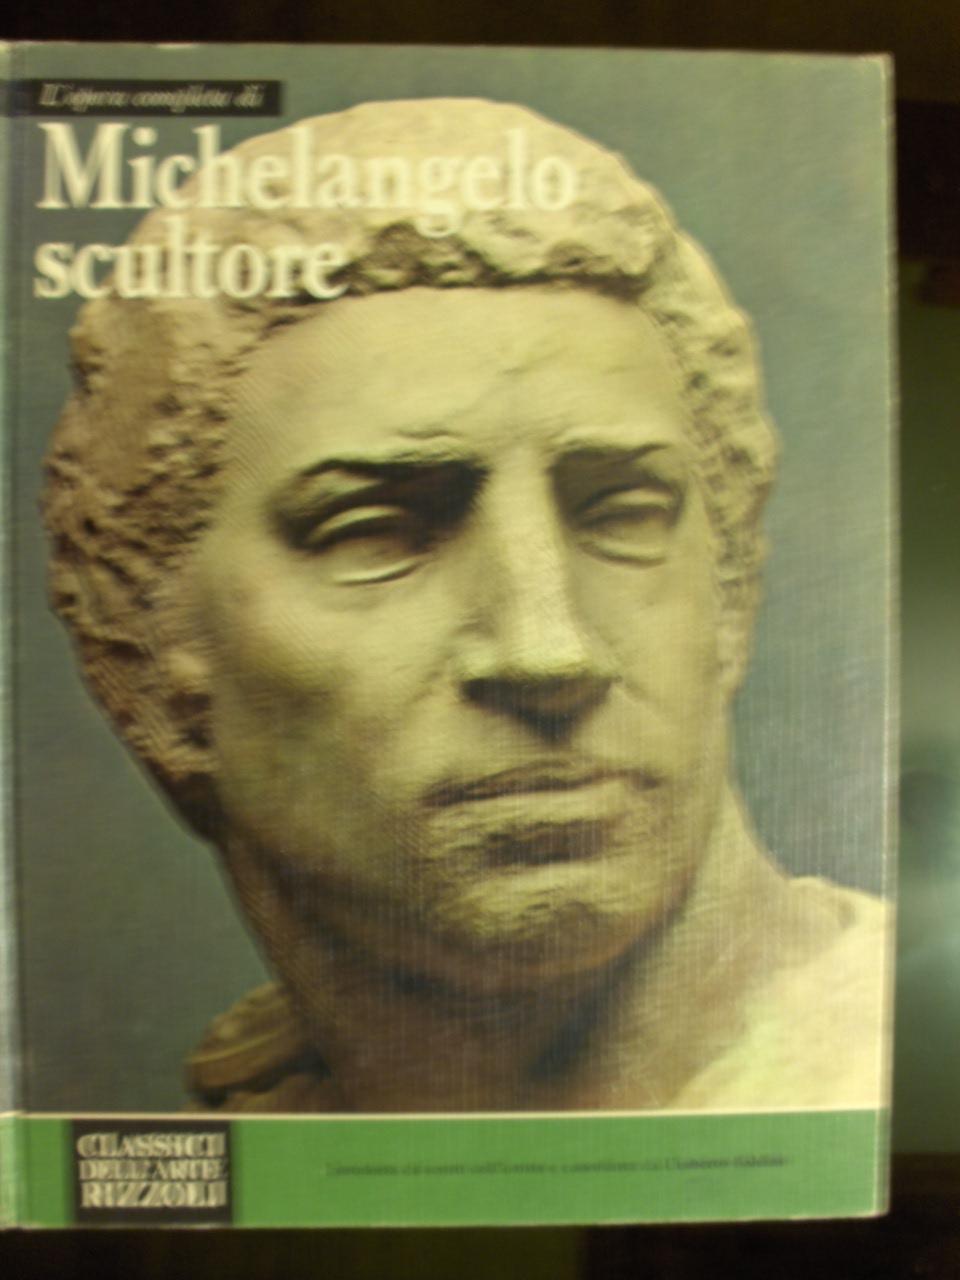 L'opera completa di Michelangelo scultore